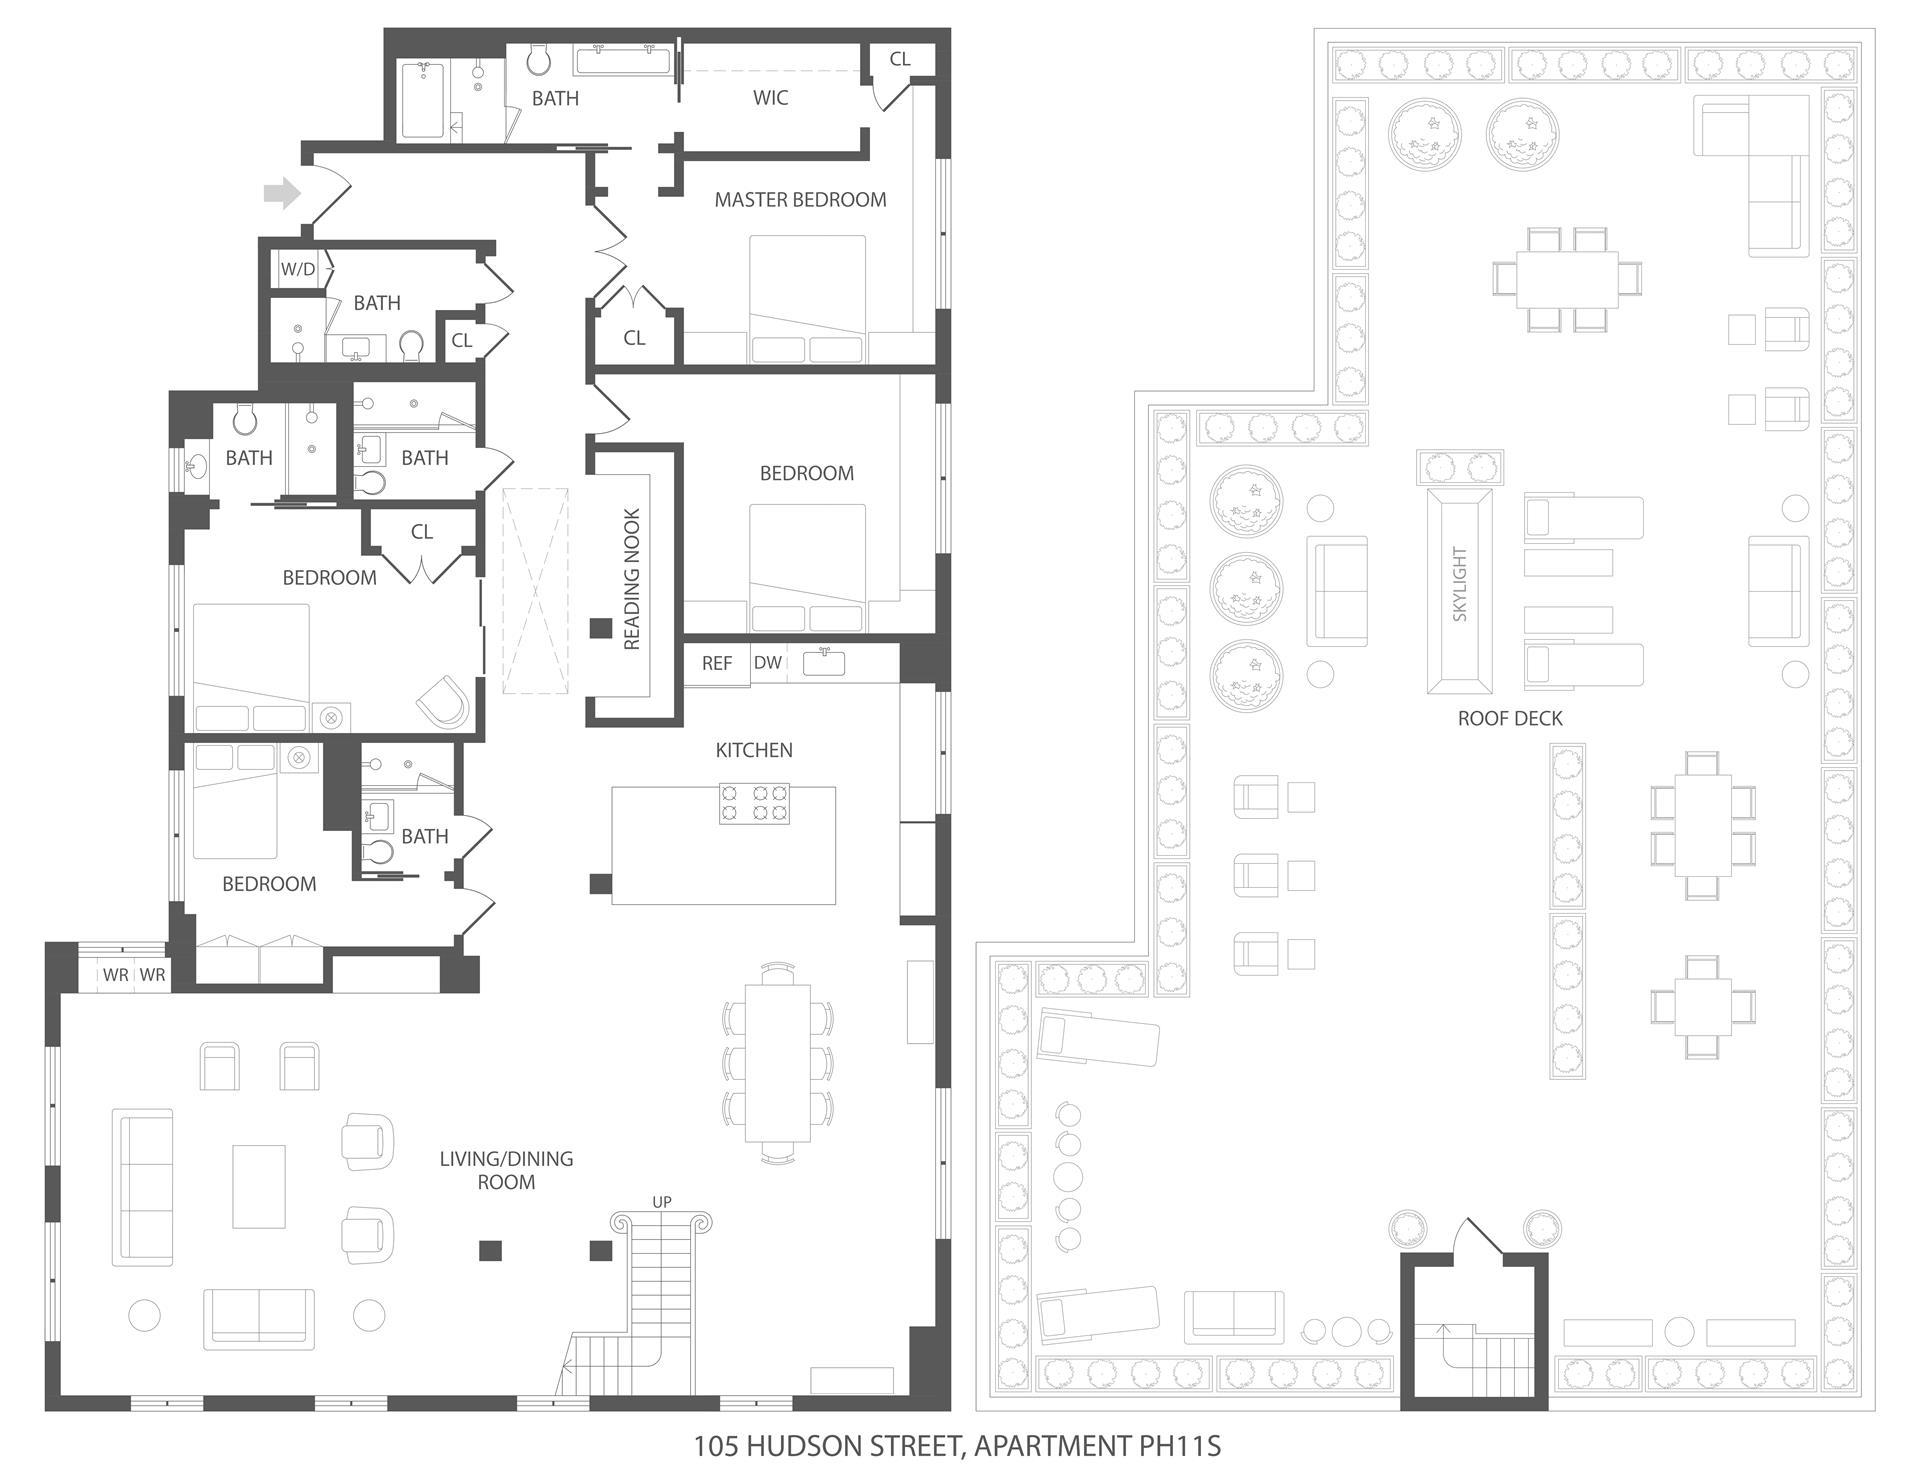 Floor plan of The Powell Building, 105 Hudson St, PH11S - TriBeCa, New York